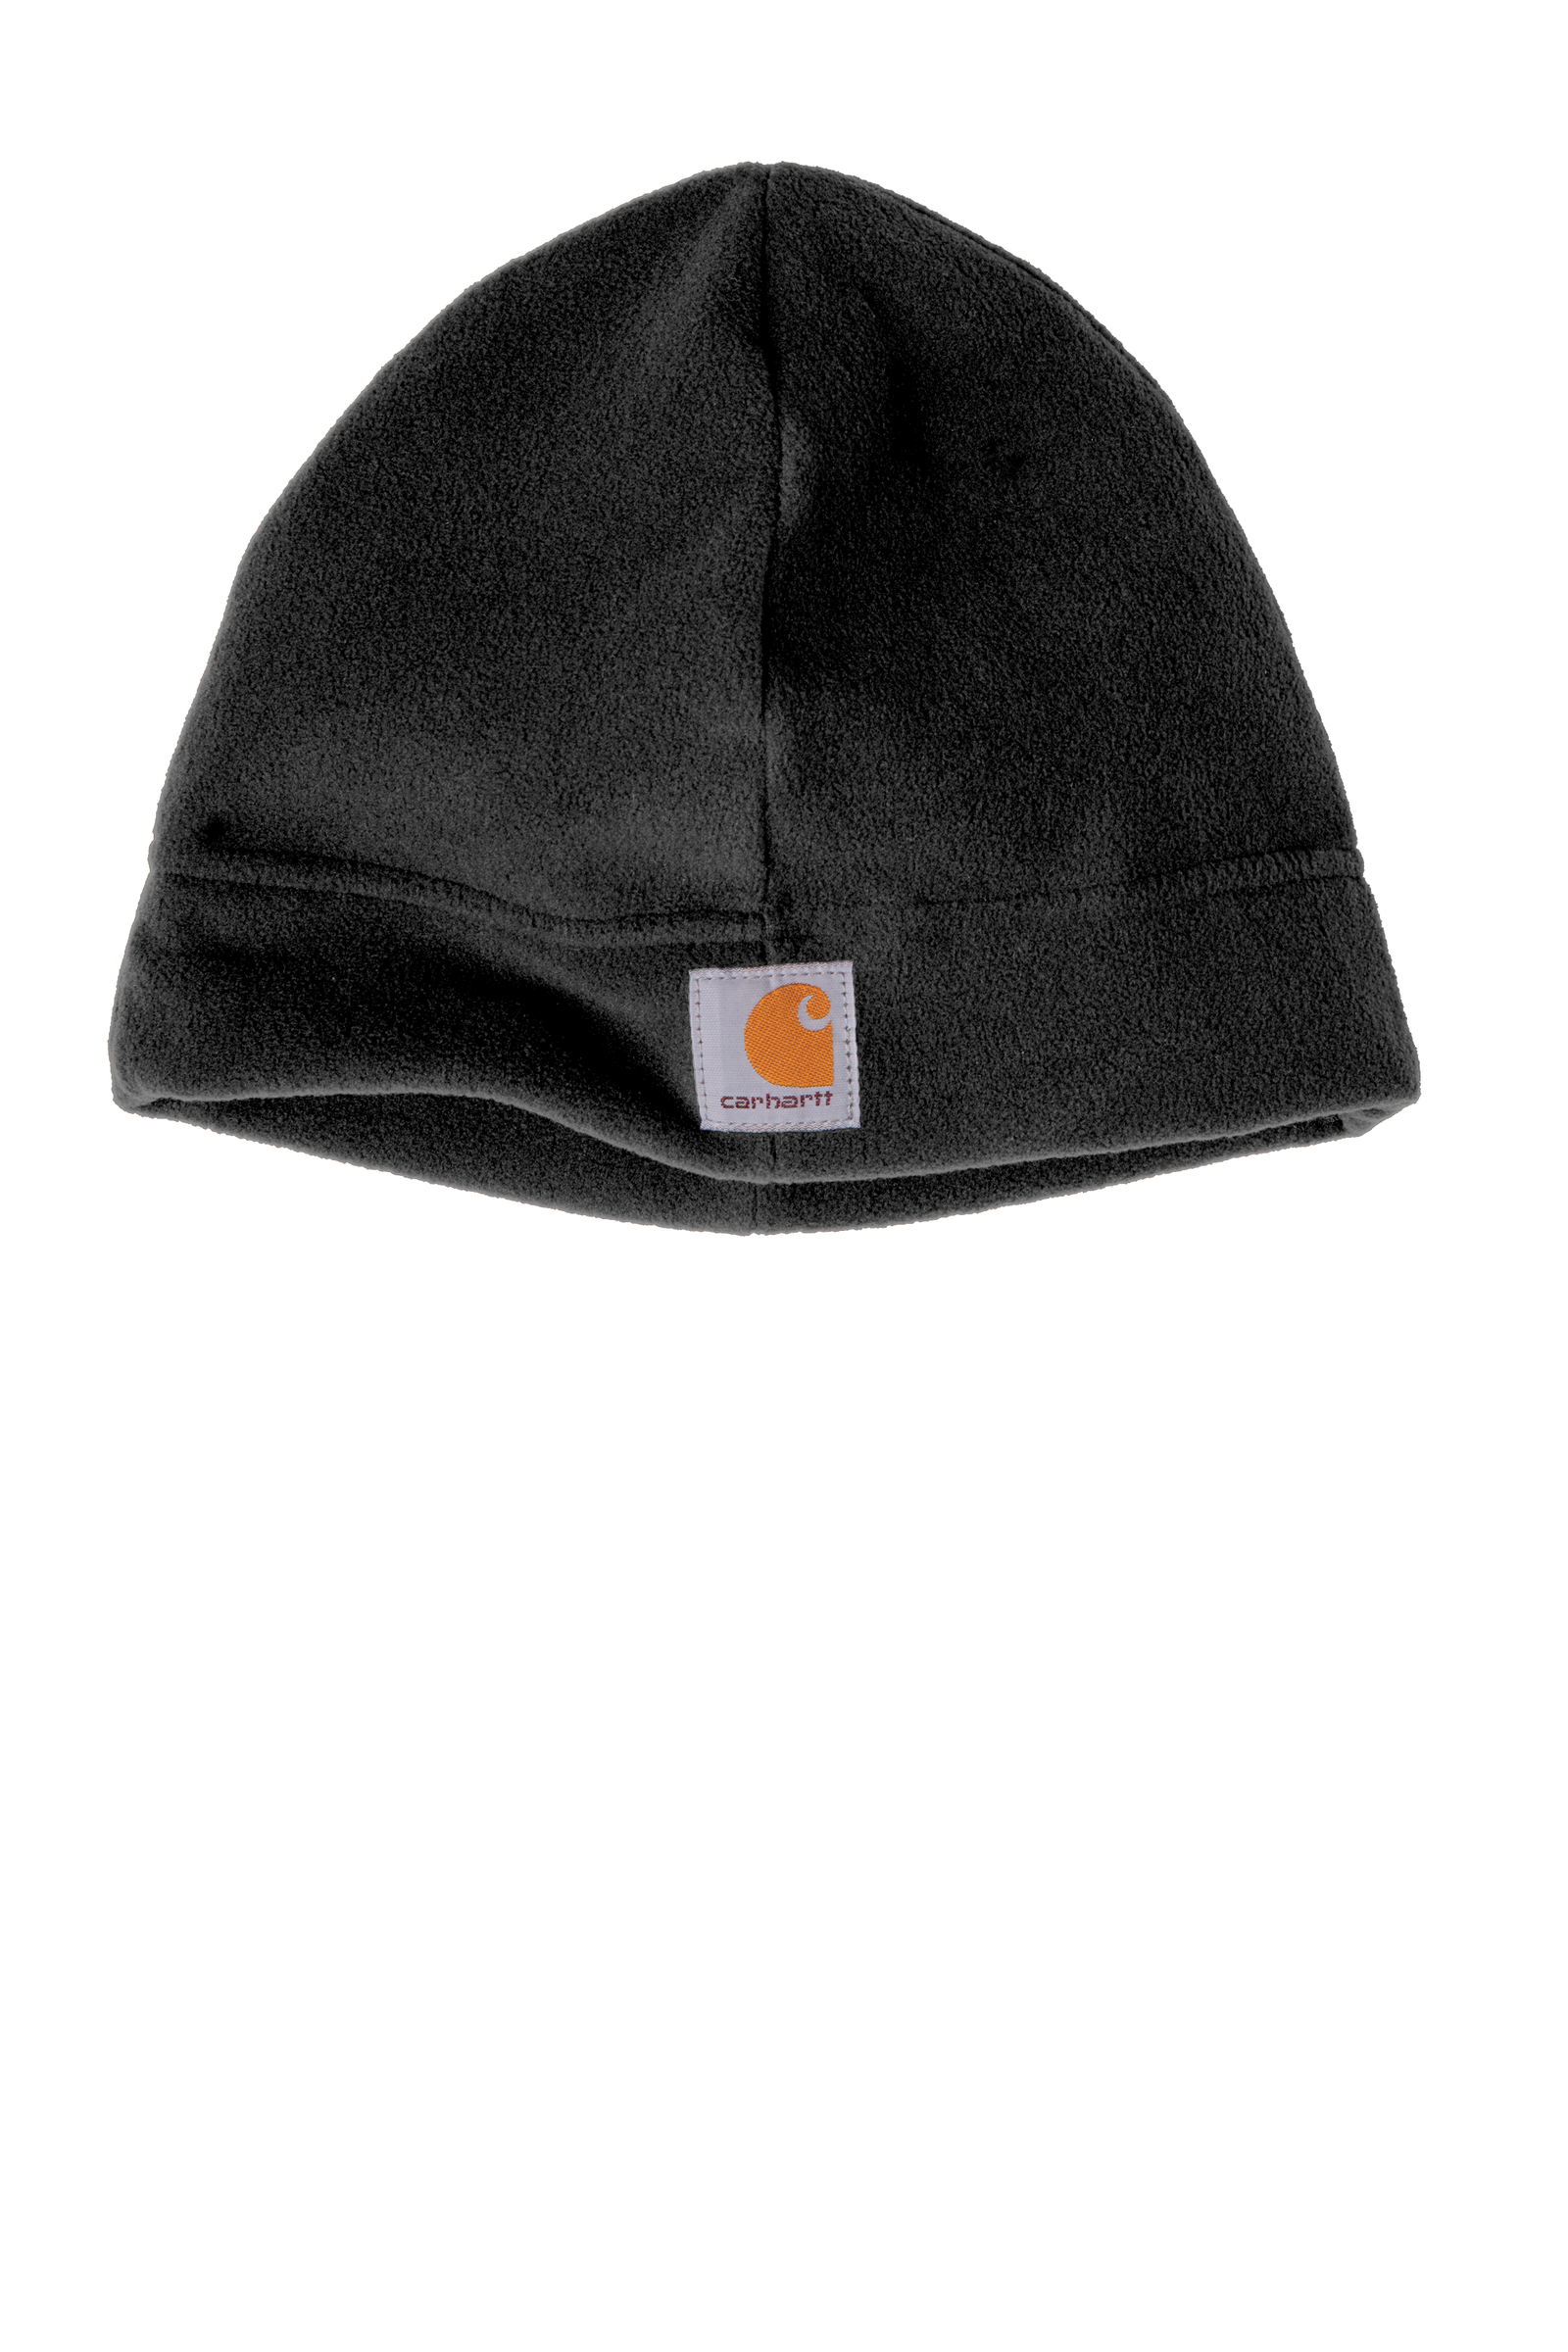 Carhartt Embroidered Fleece Hat